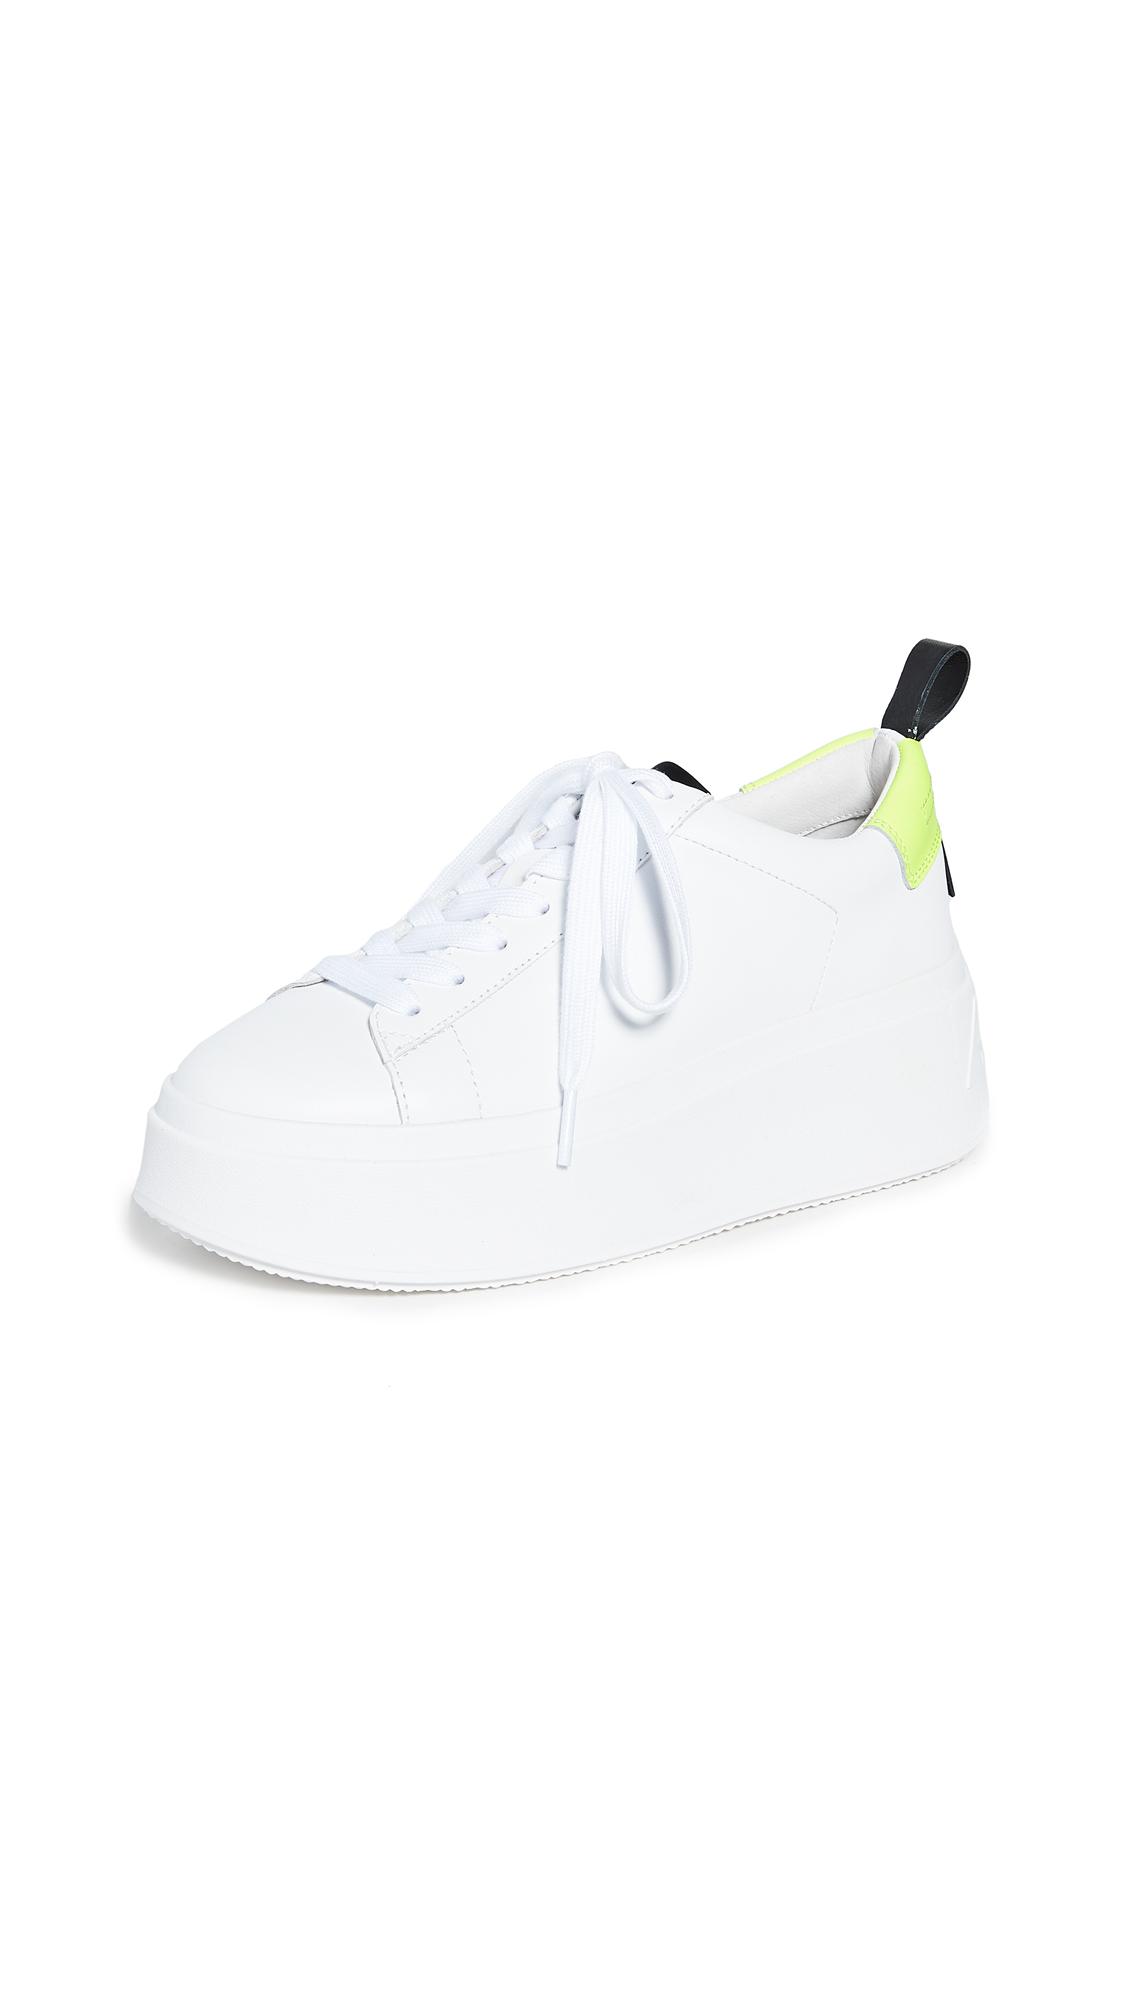 Ash Moon Platform Sneakers - White/Fluo Yellow/Black